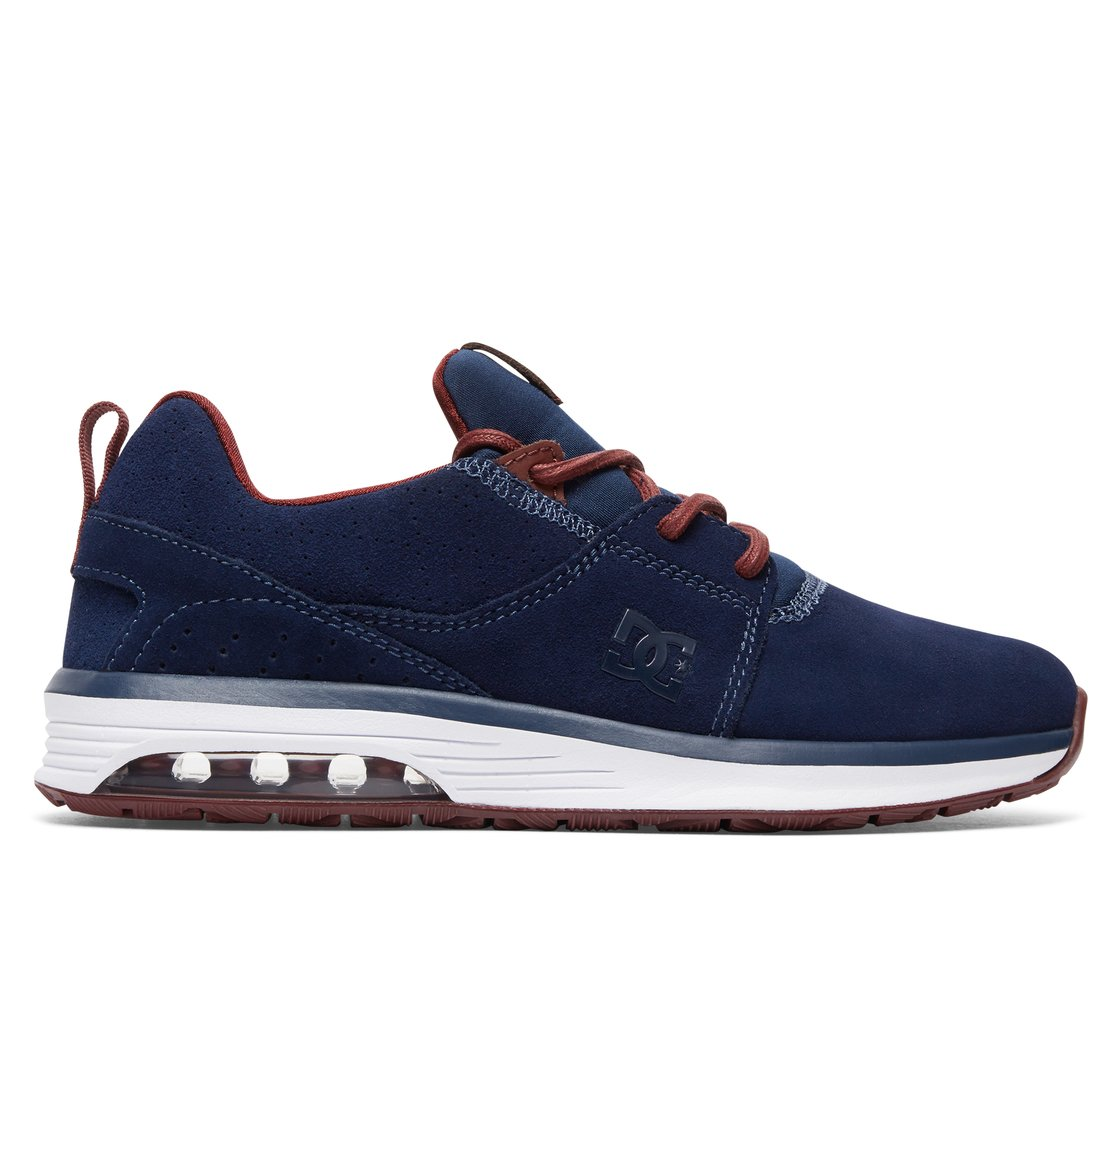 Chaussures de skate DC shoes Heathrow xJeDywm